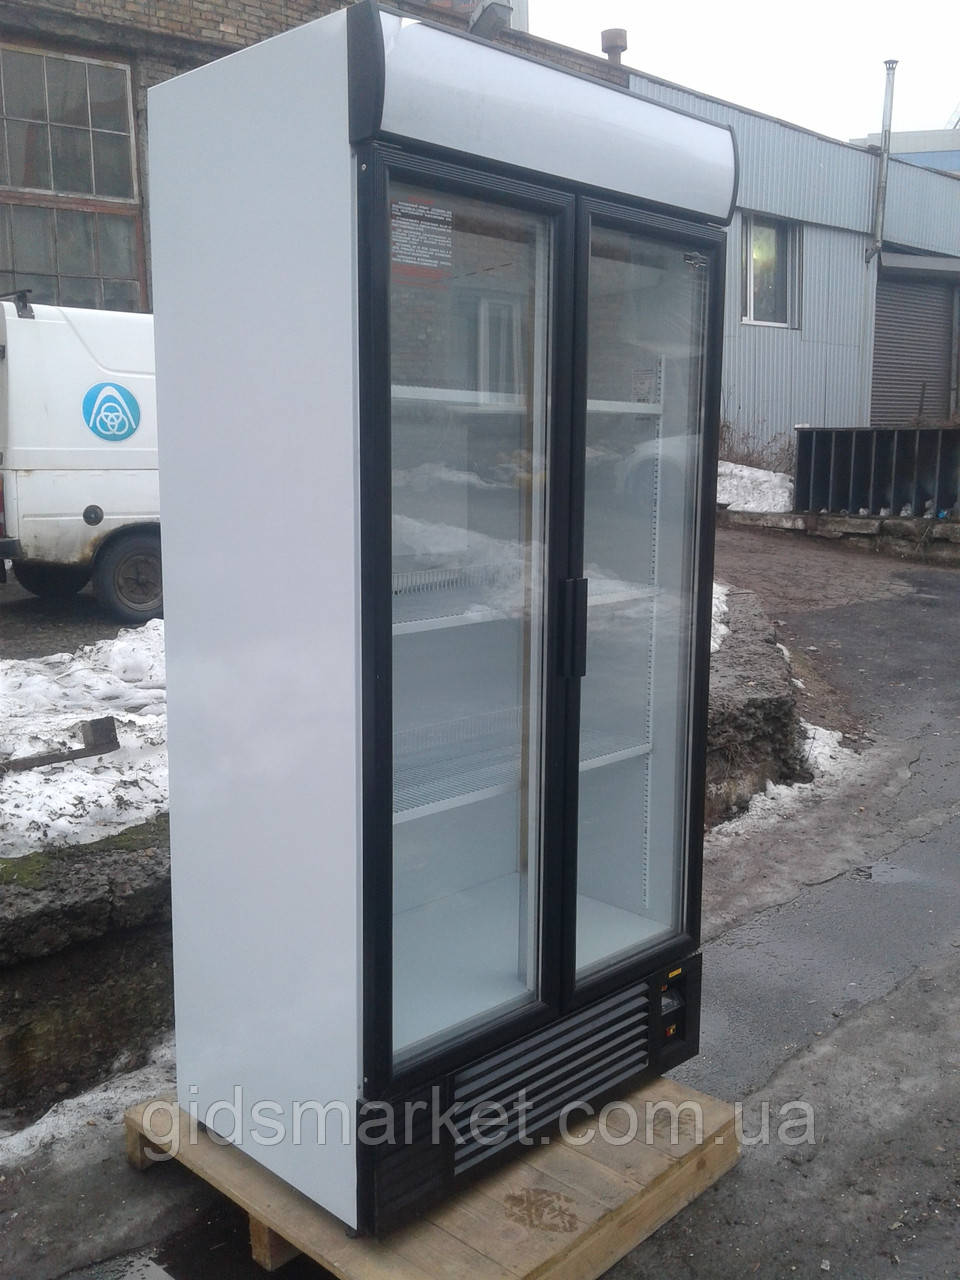 Холодильный шкаф Интер Т-600 б у, Холодильный шкаф б/у, холодильная камера б/у, холодильная витрина б у, шкаф